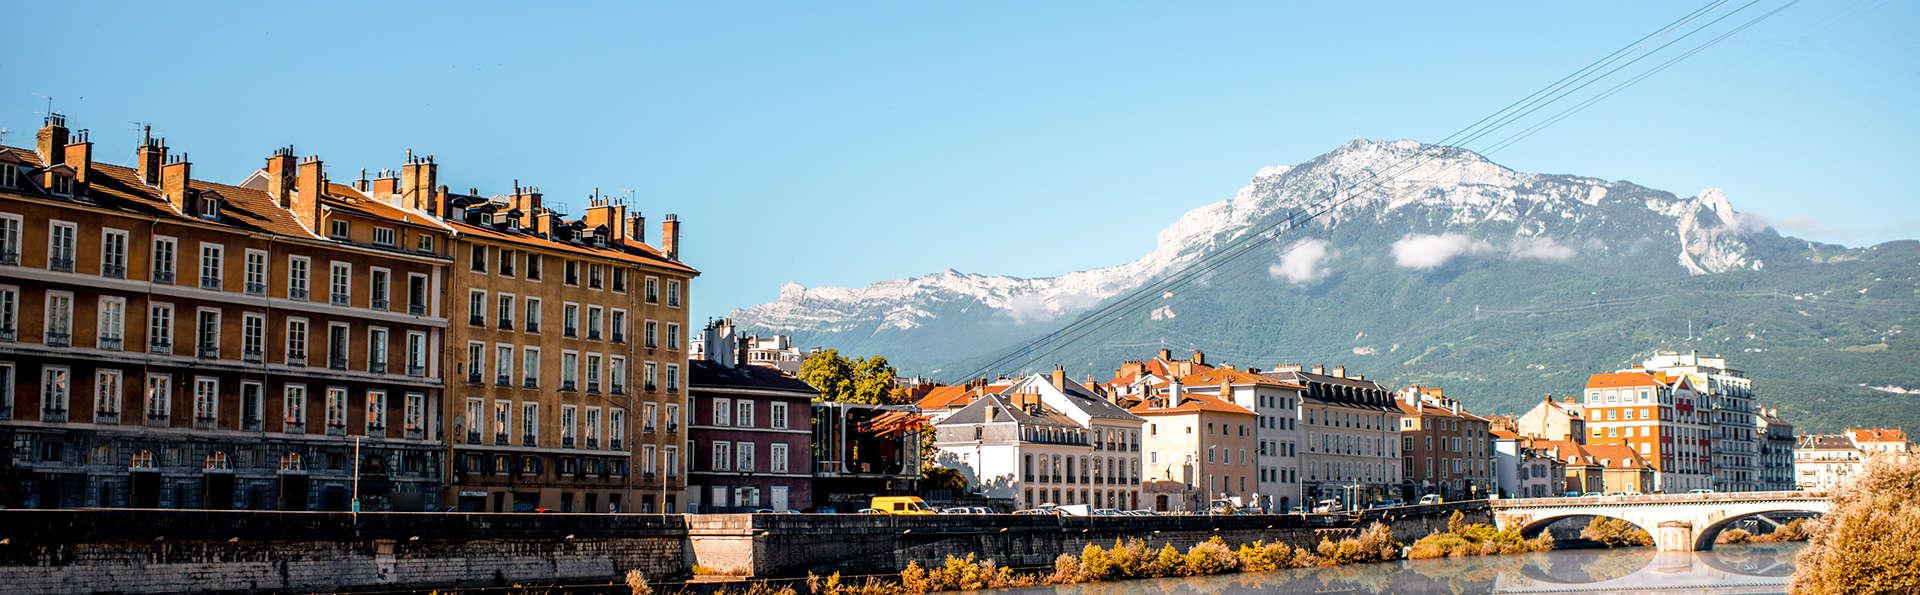 Comfort Suites Universités Grenoble Est - Edit_Grenoble.jpg